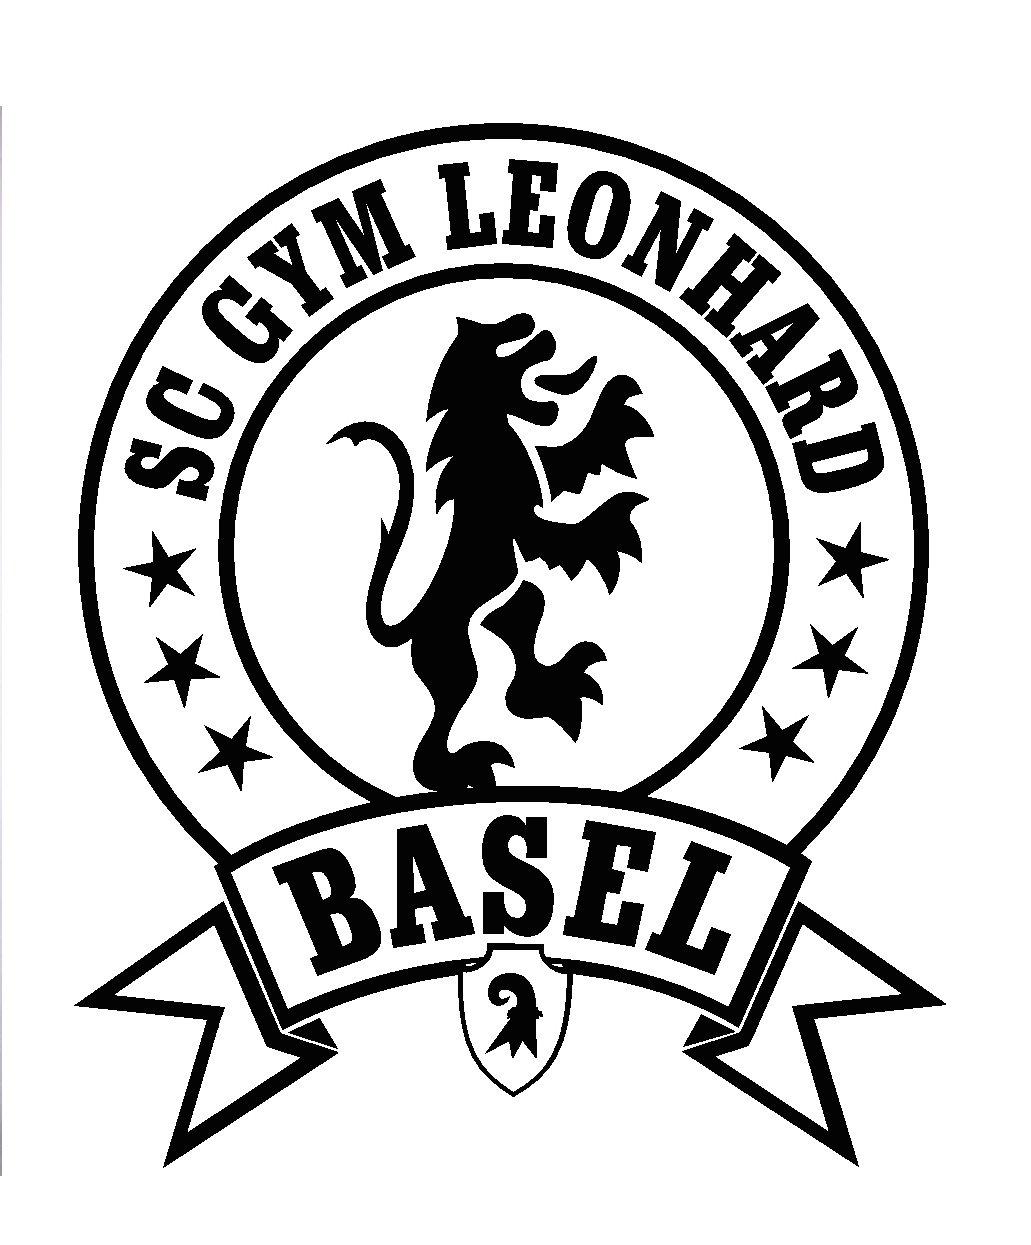 SC Gym Leonhard